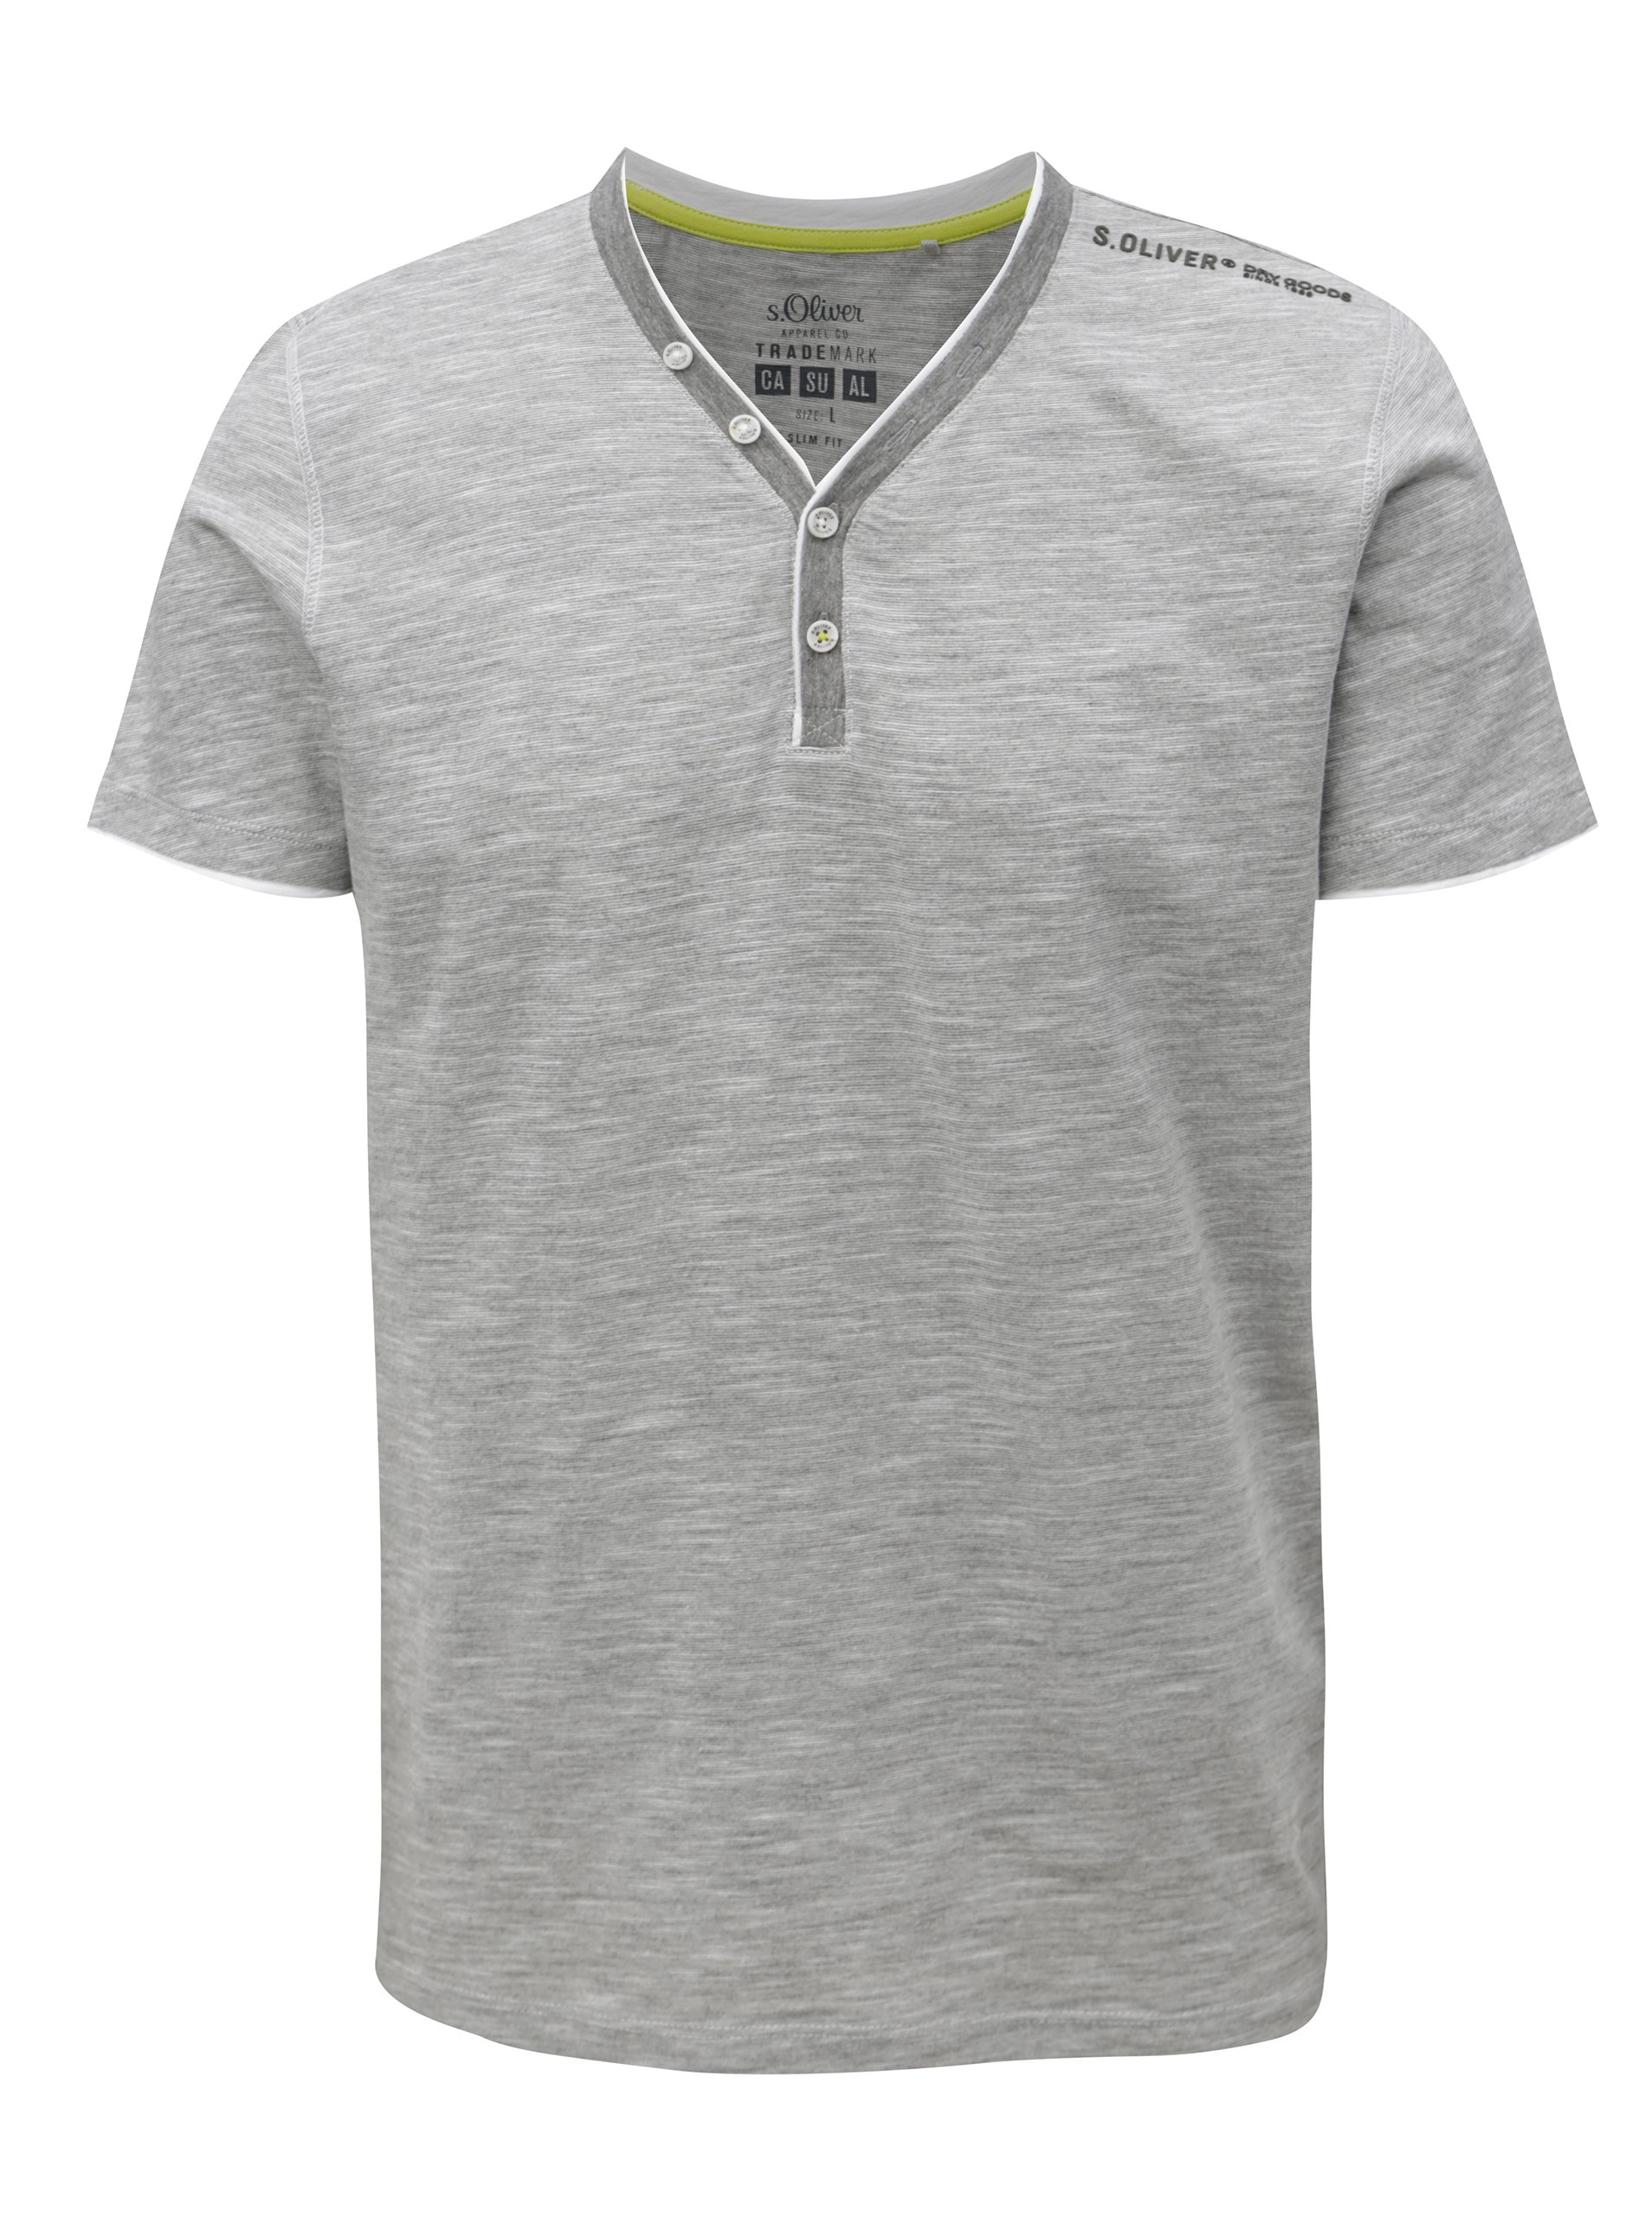 Sivé pruhované pánske slim fit tričko s.Oliver 15978655b61